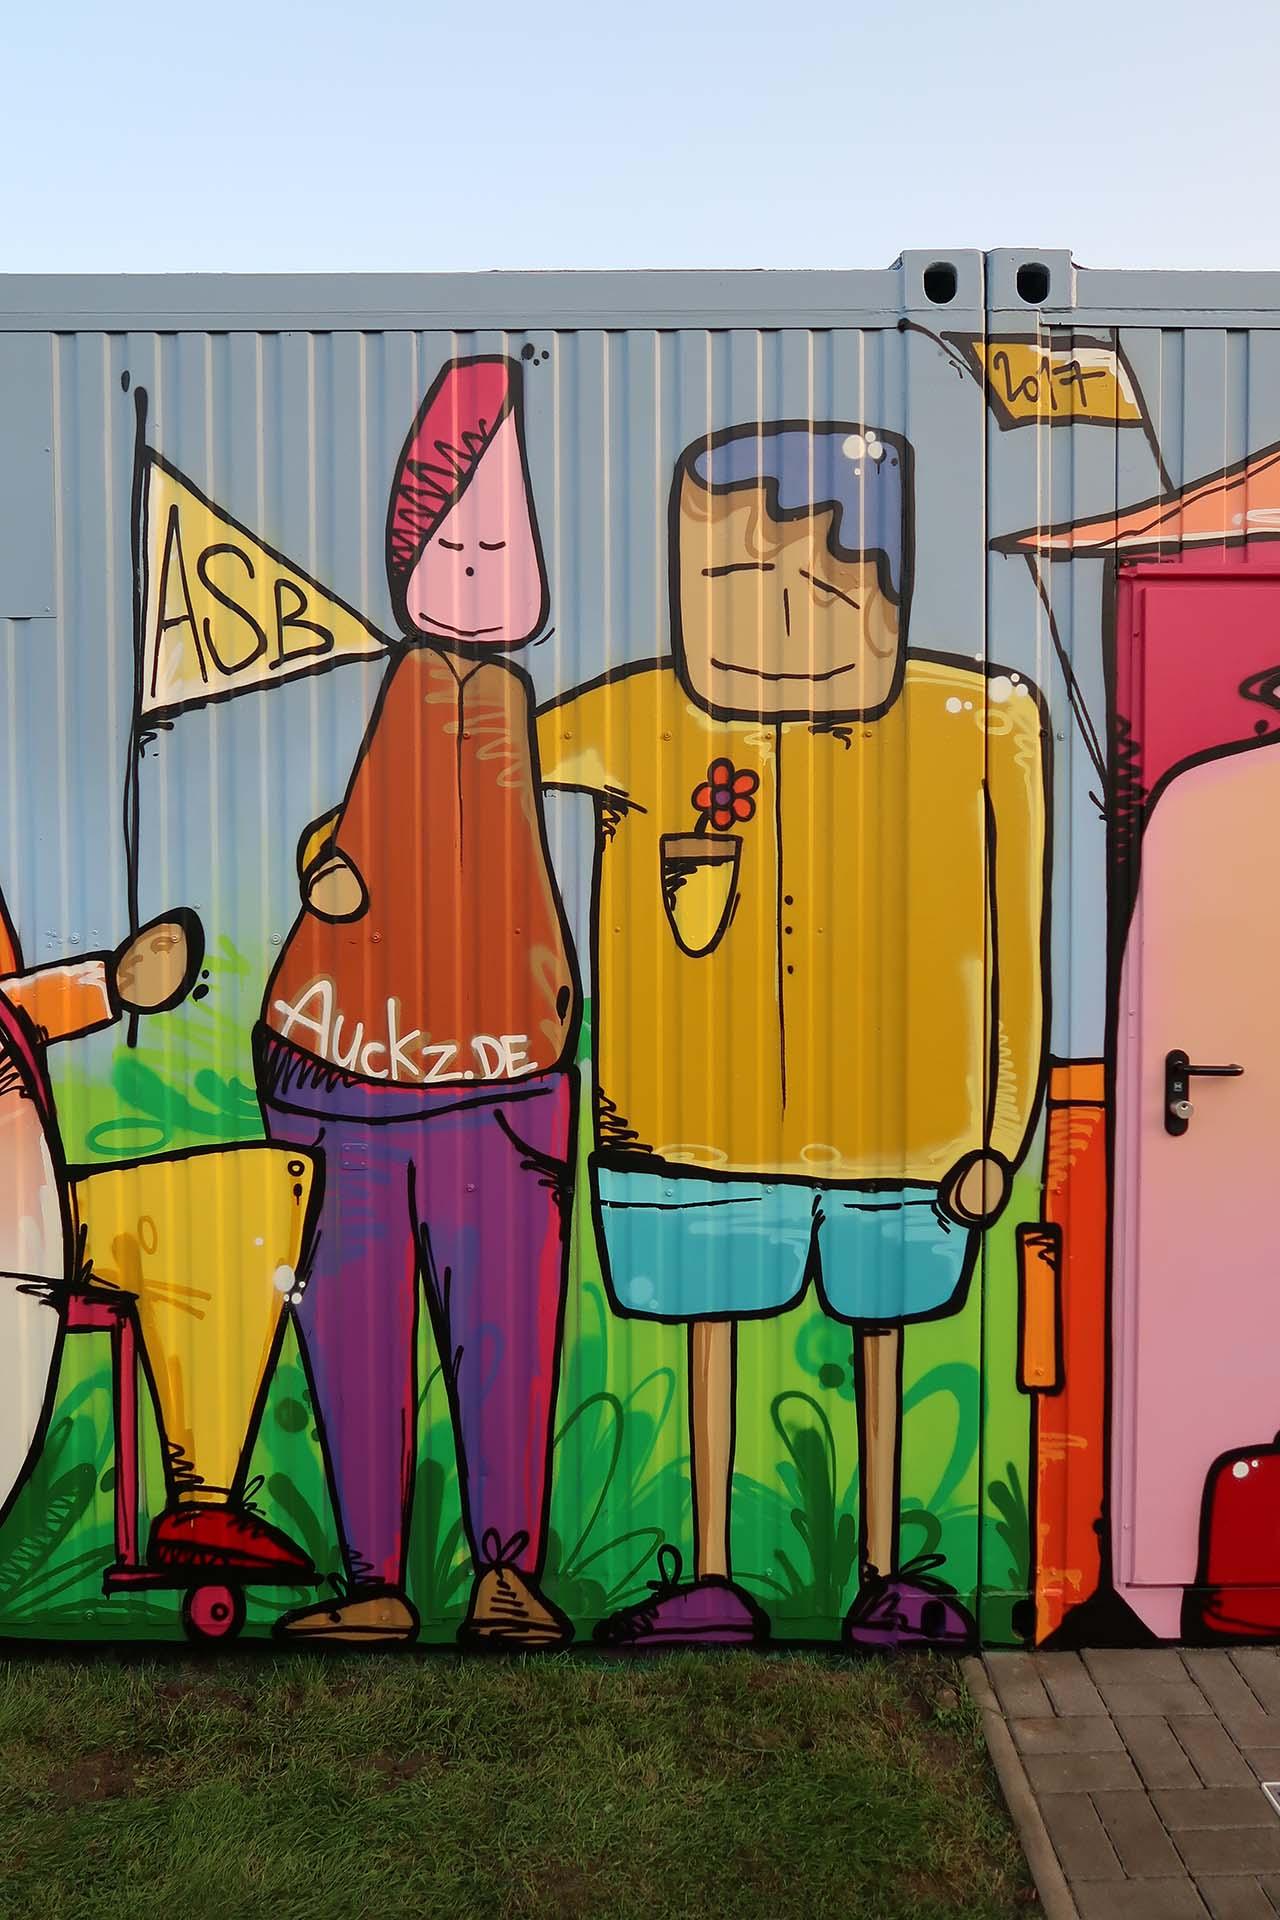 Graffiti, Asb, Münster, Auckz, Container, Sprayen, Figuren, Menschen, Bennet Grüttner